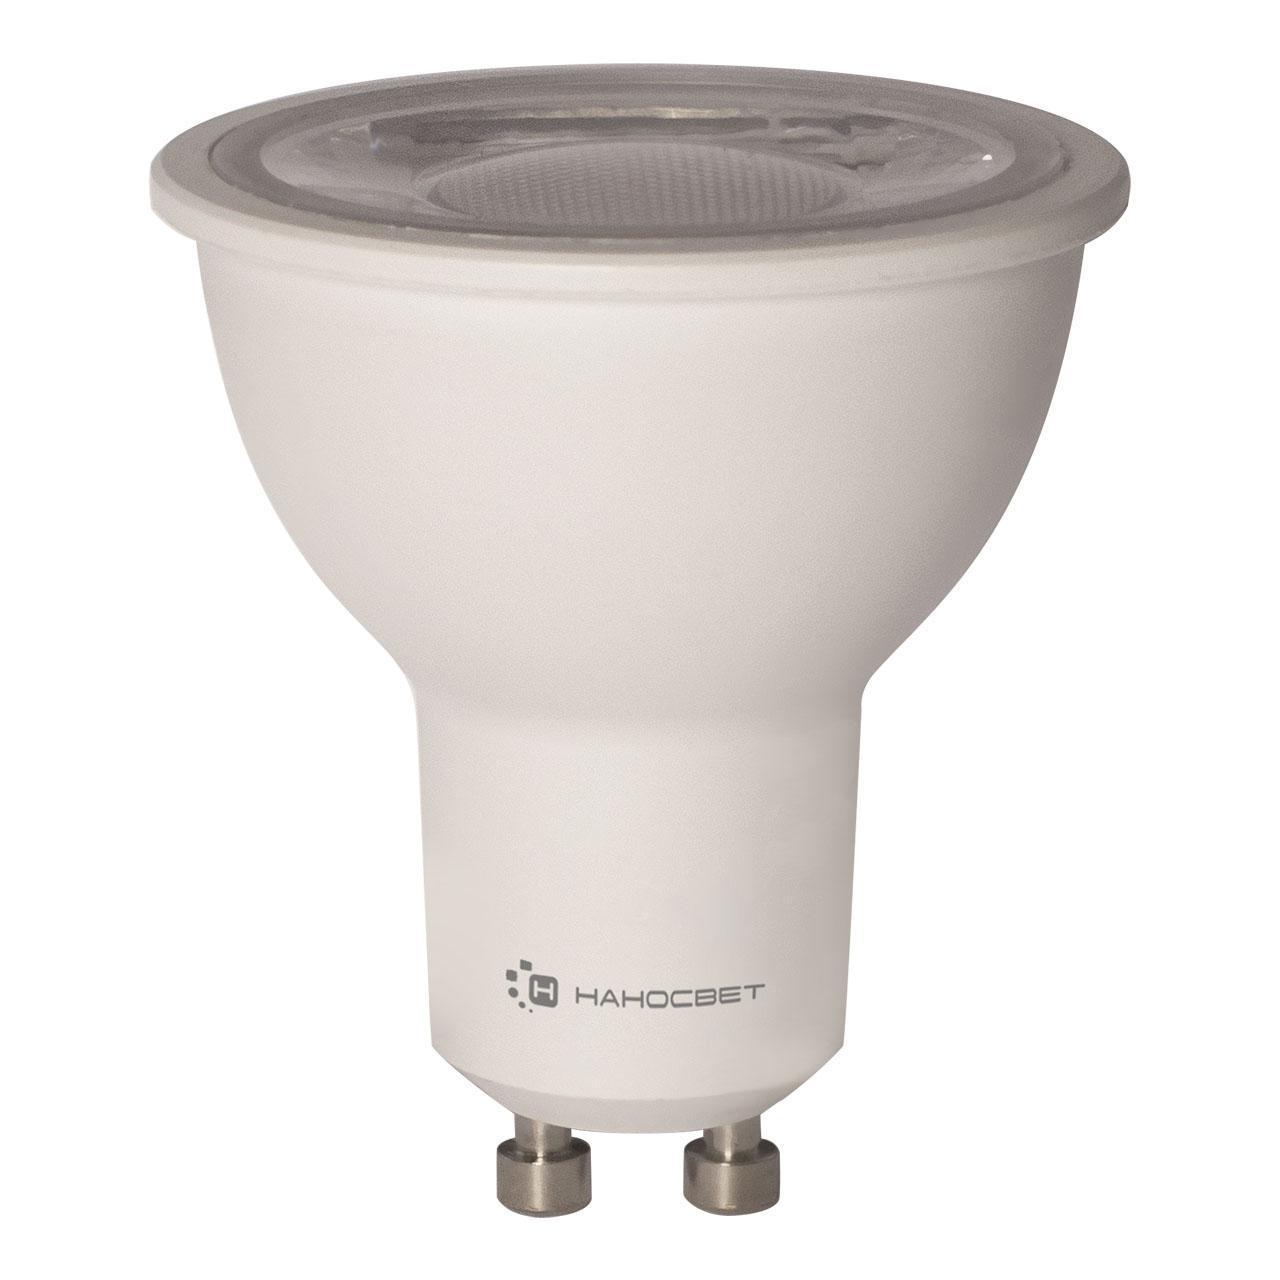 Лампа светодиодная диммируемая GU10 8W 2700K прозрачная LH-MR16-D-8/GU10/827 L242 лента светодиодная полусфера наносвет l286 gu10 8 5w 2700k lh mr16 8 5 gu10 827 38d